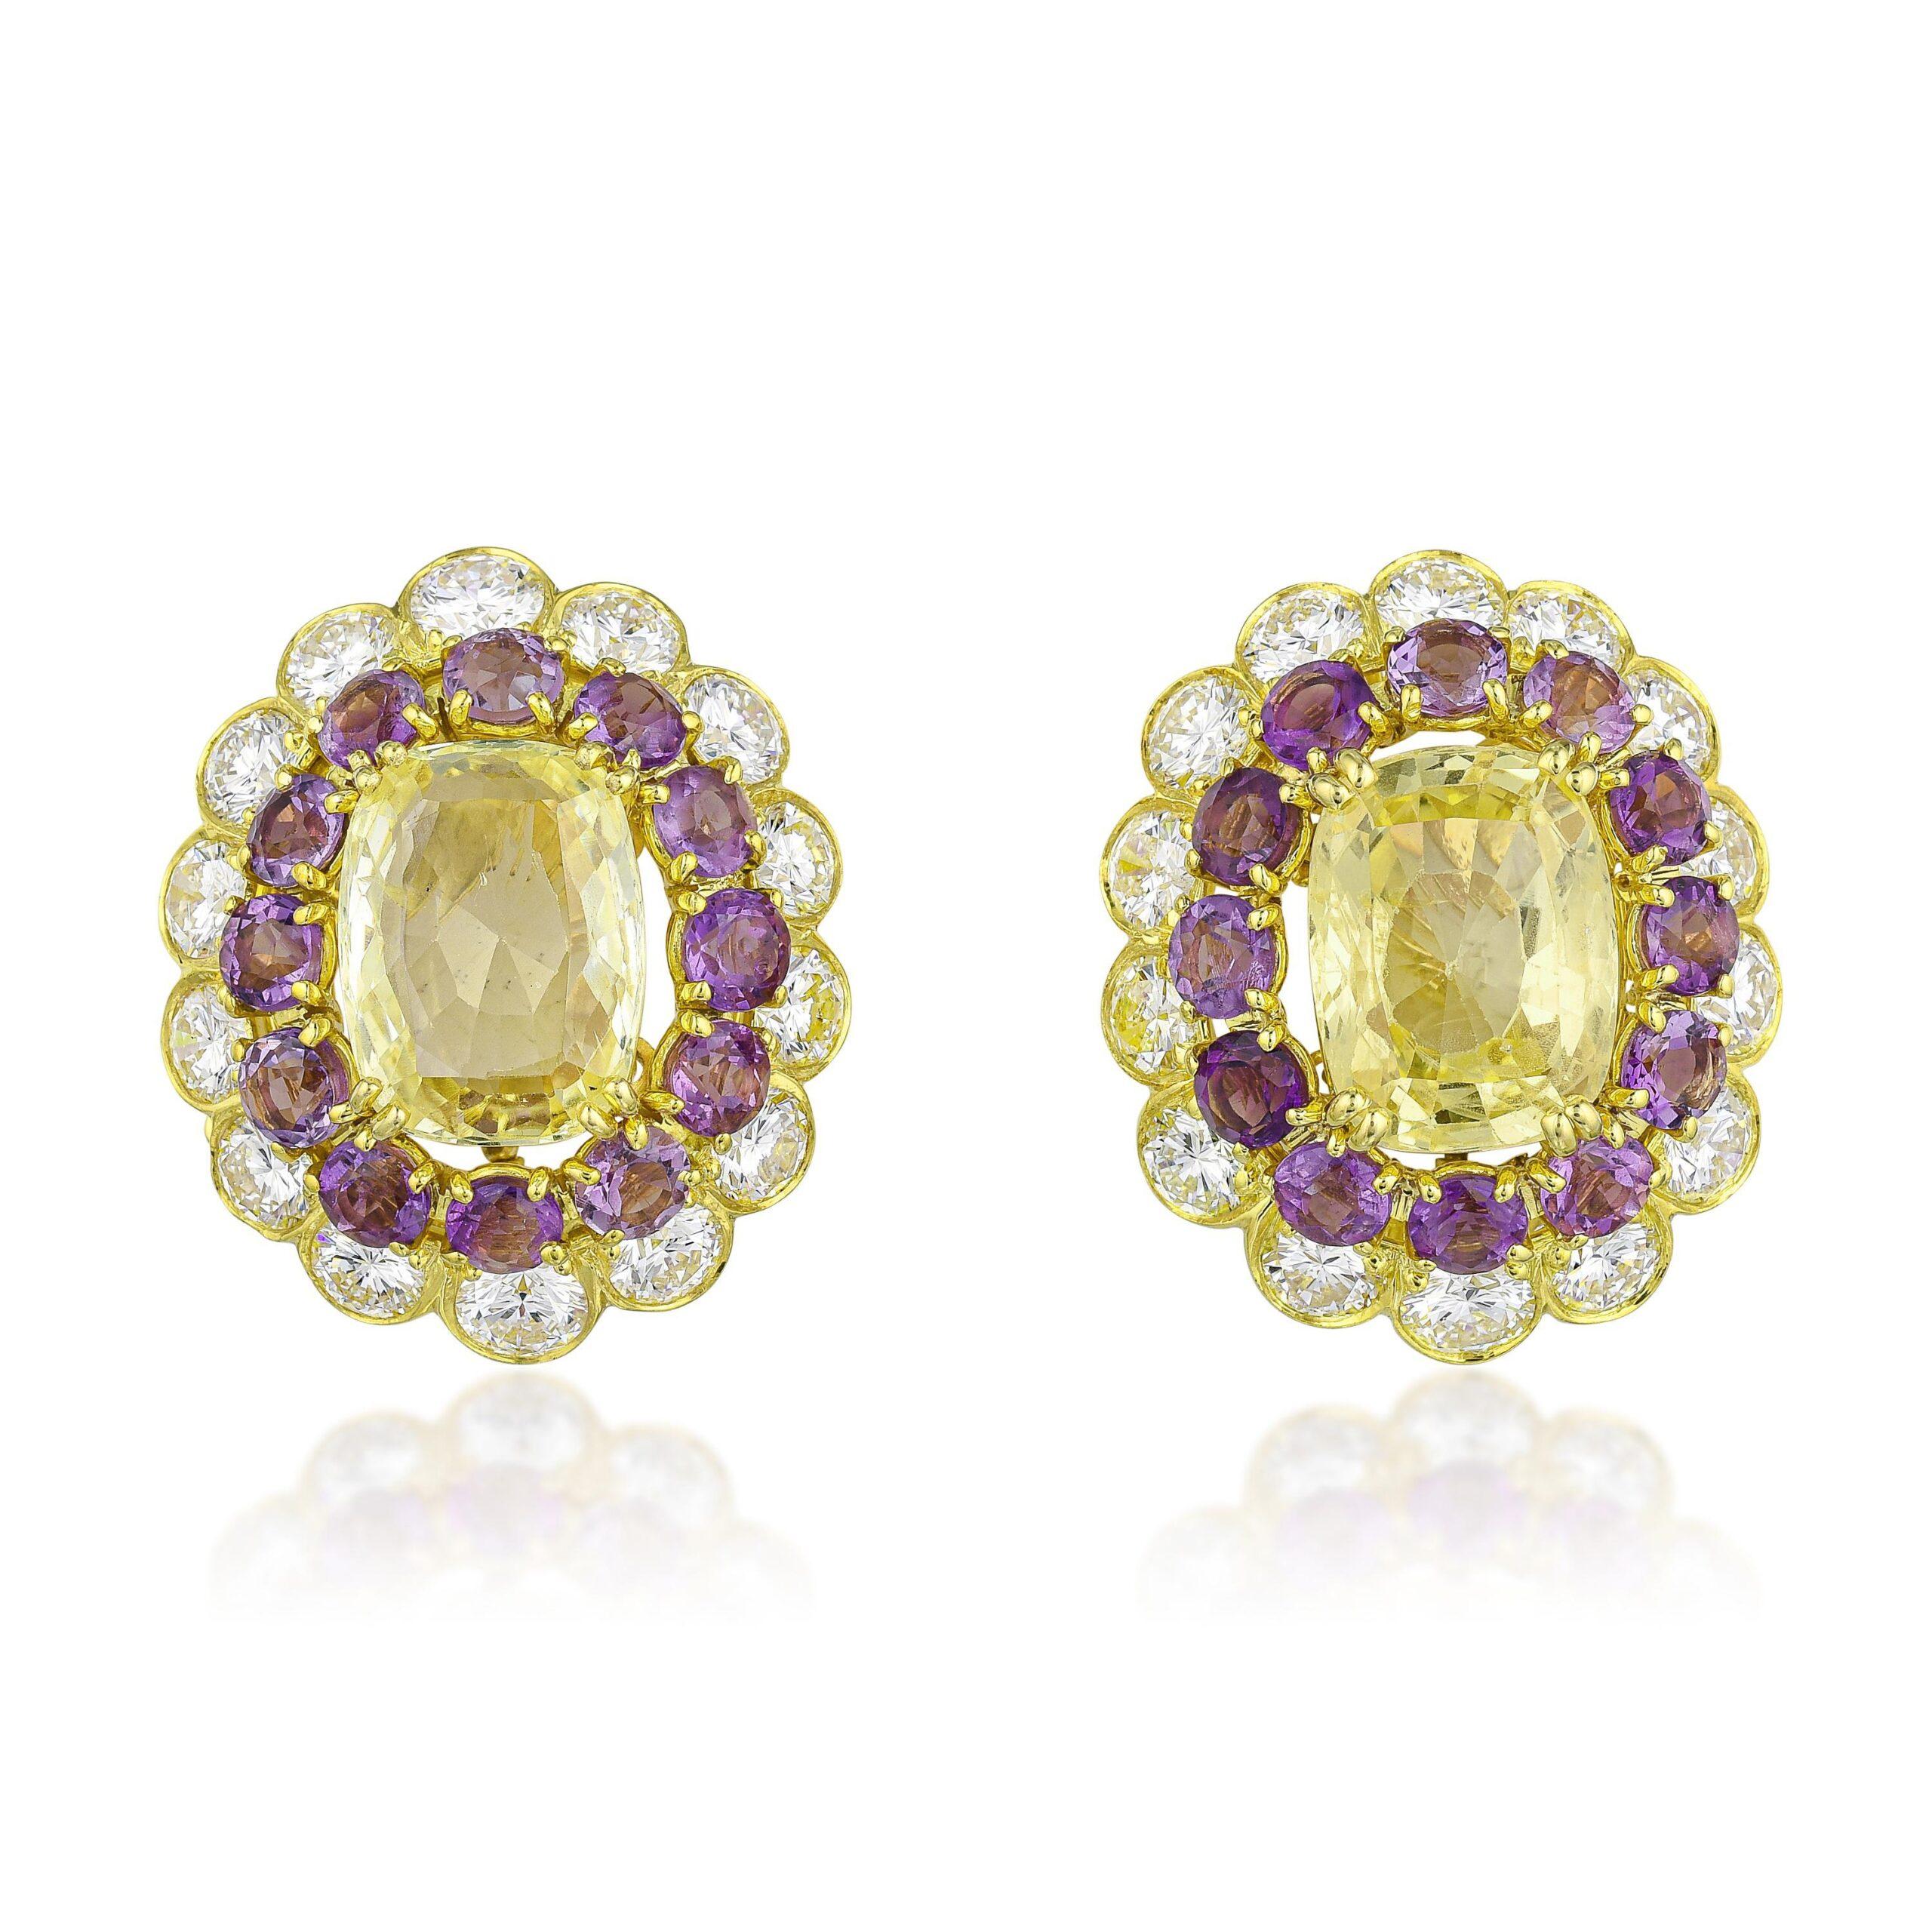 Van Cleef & Arpels Yellow Sapphire Amethyst and Diamond Earclips